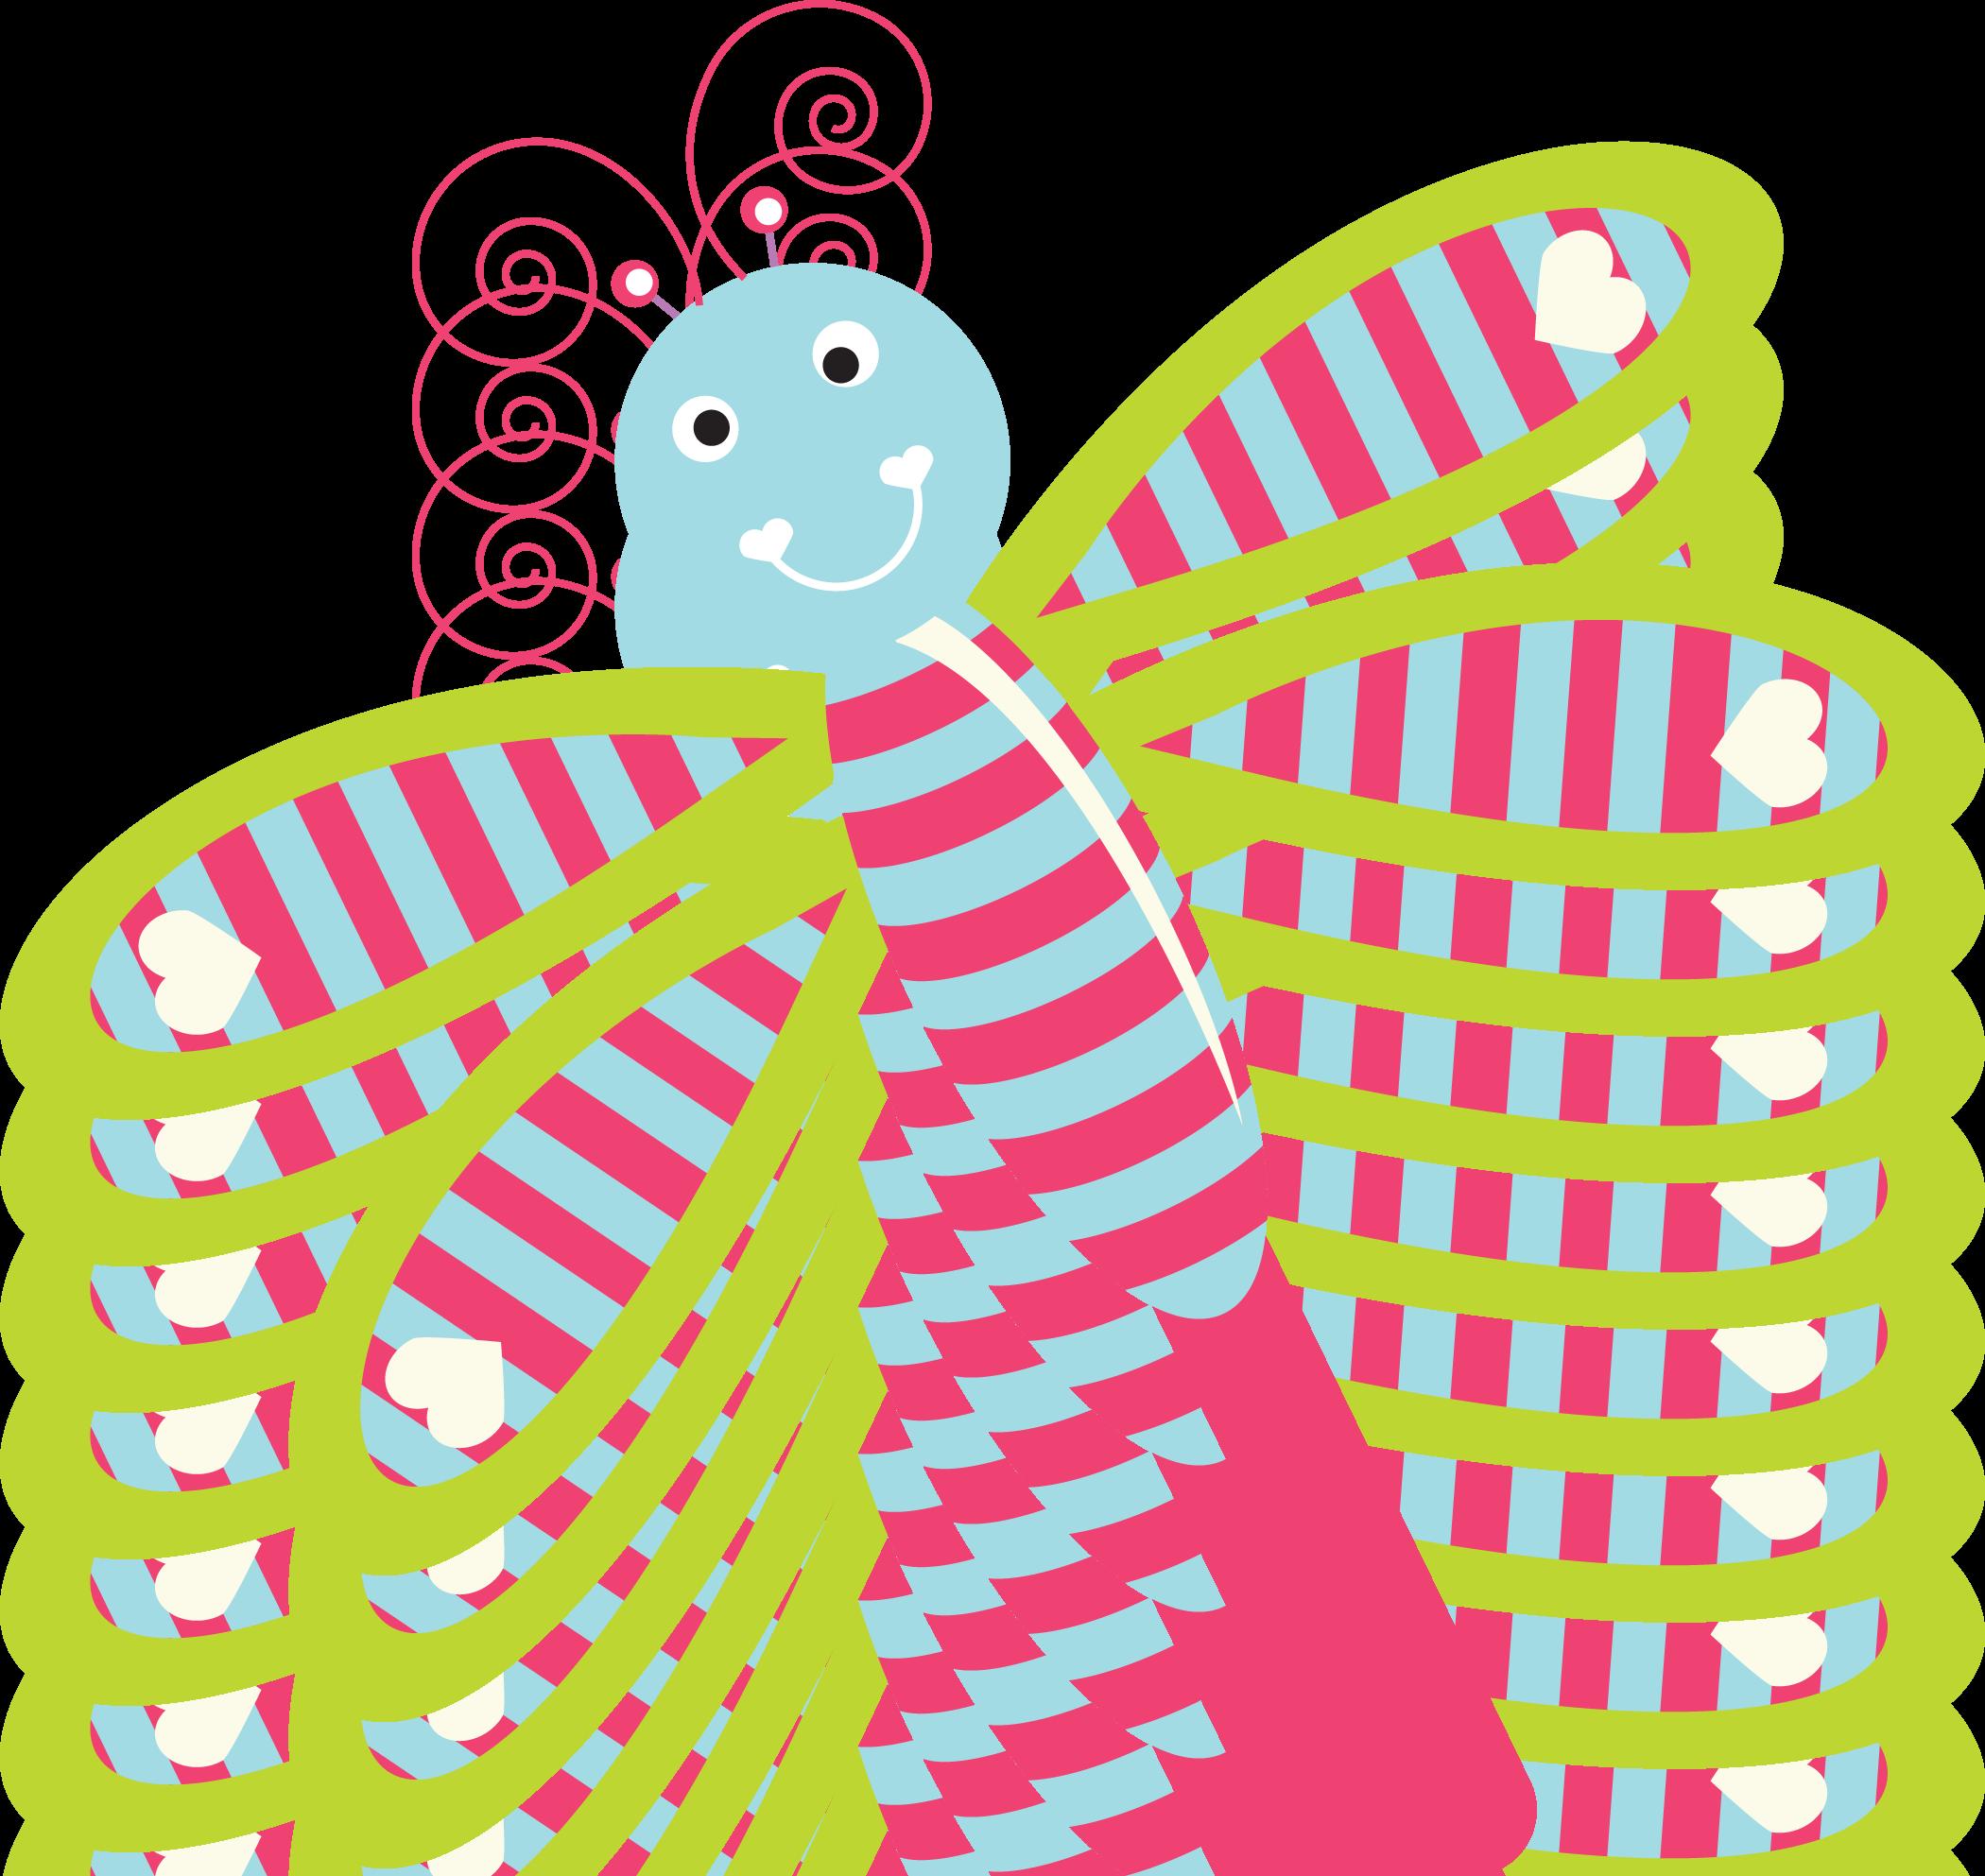 Flower clipart dragonfly. Photo by daniellemoraesfalcao minus